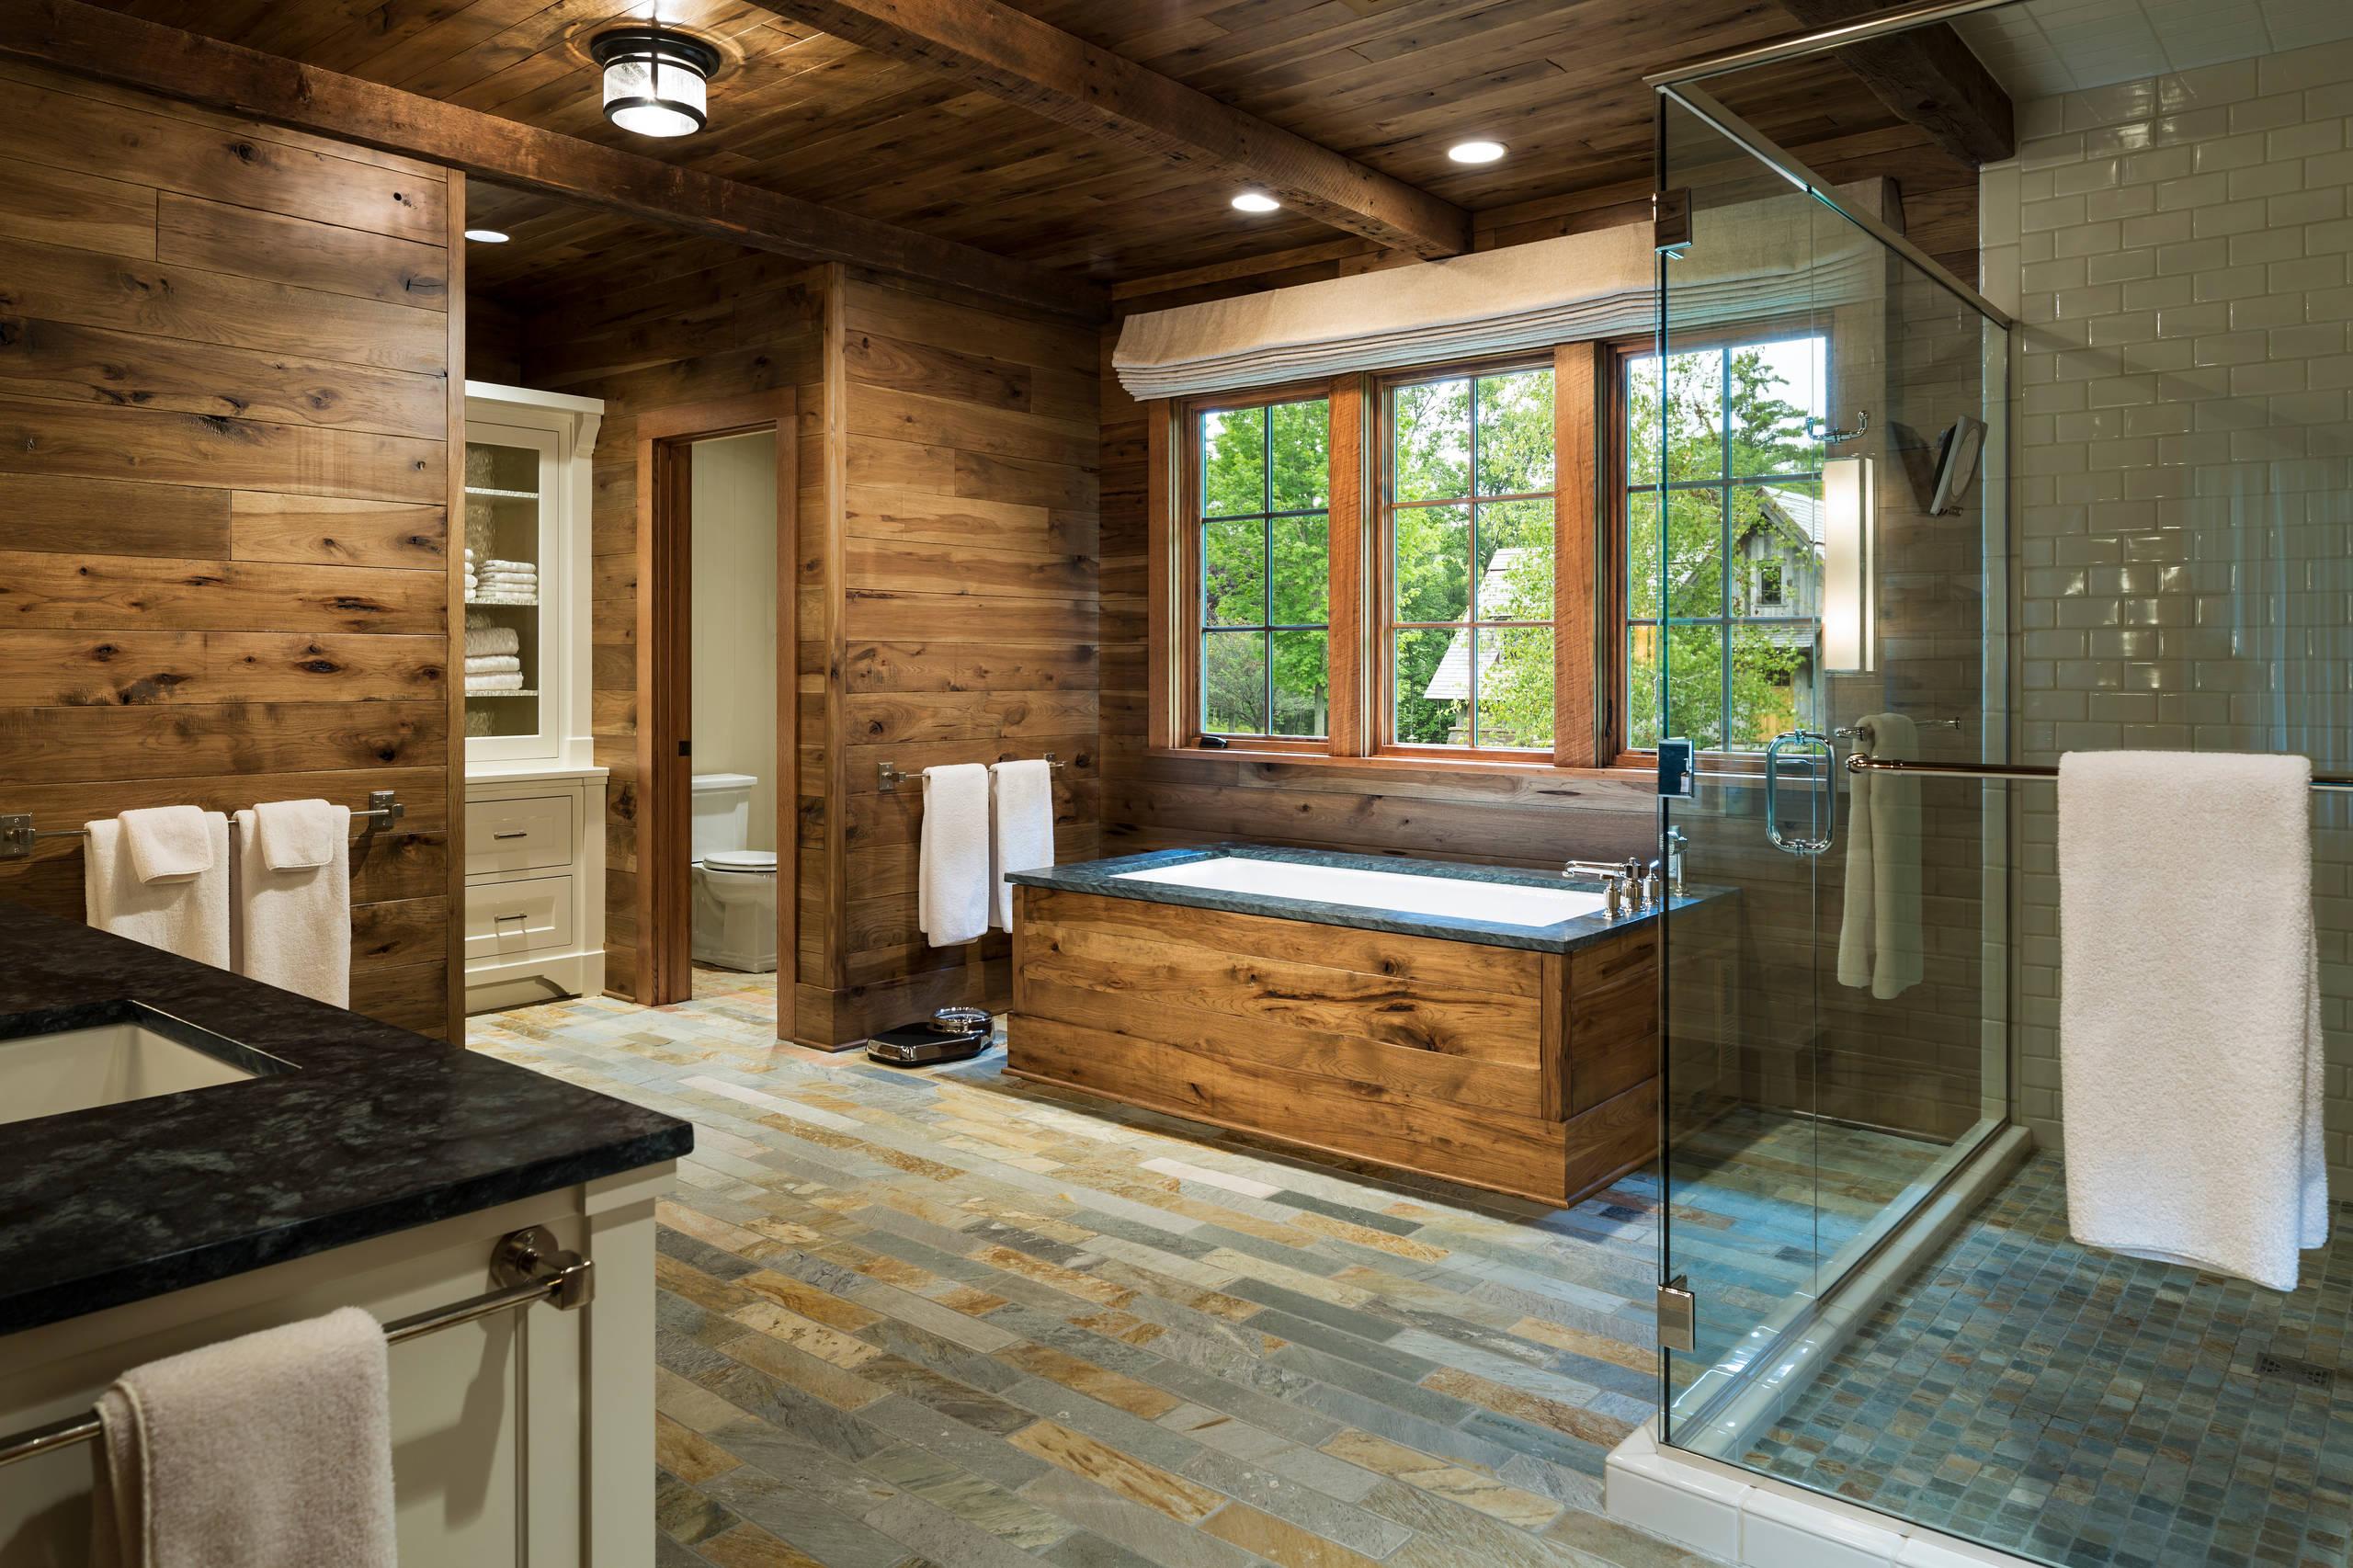 16 Fantastic Rustic Bathroom Designs That Will Take Your ... on Restroom Ideas  id=95137